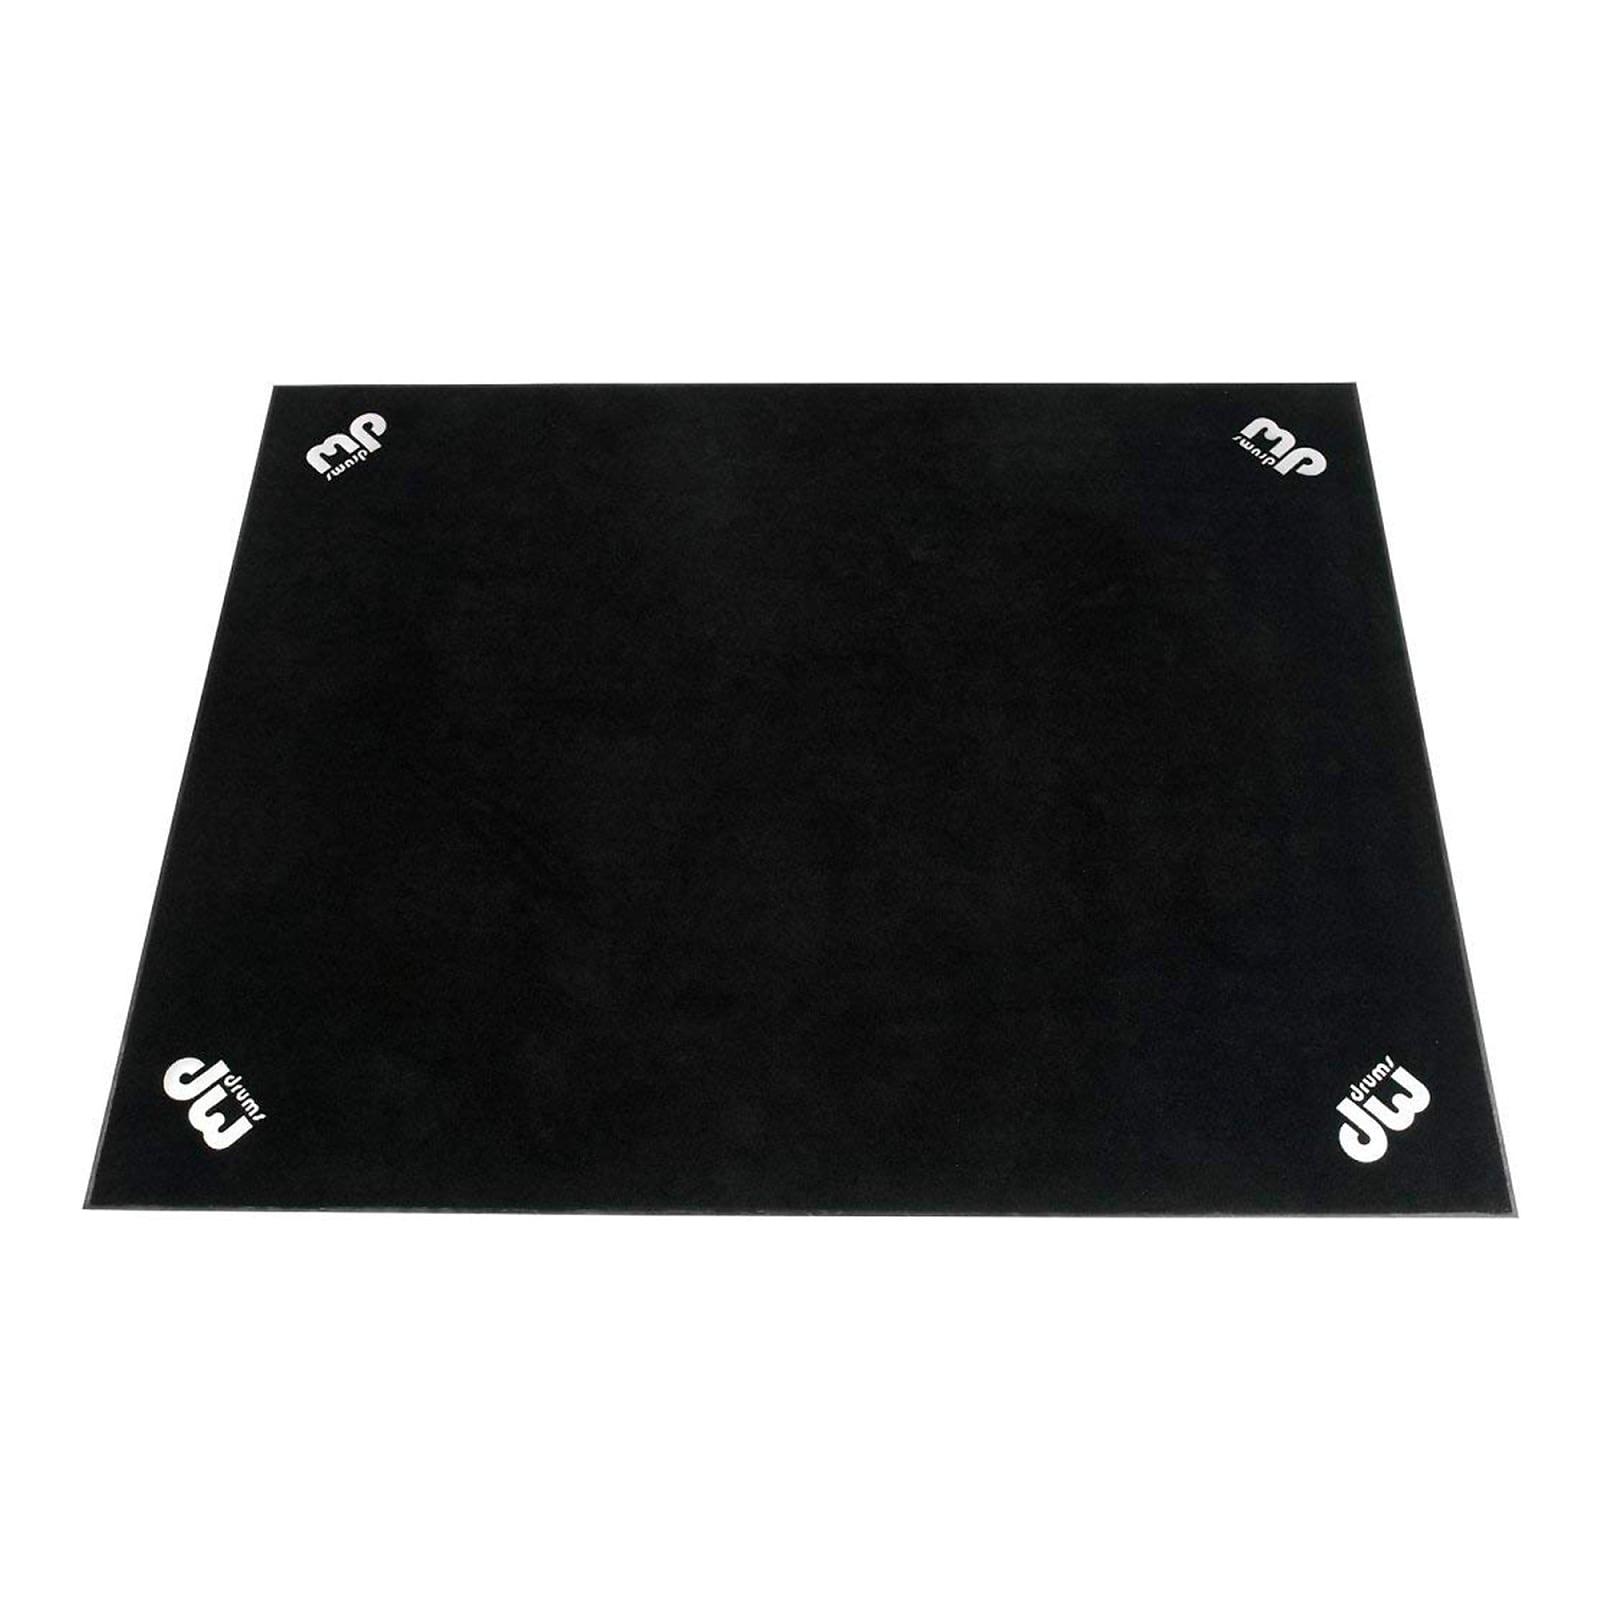 dw dwcprug2 5x7 39 drum rug w dw logos reverb. Black Bedroom Furniture Sets. Home Design Ideas